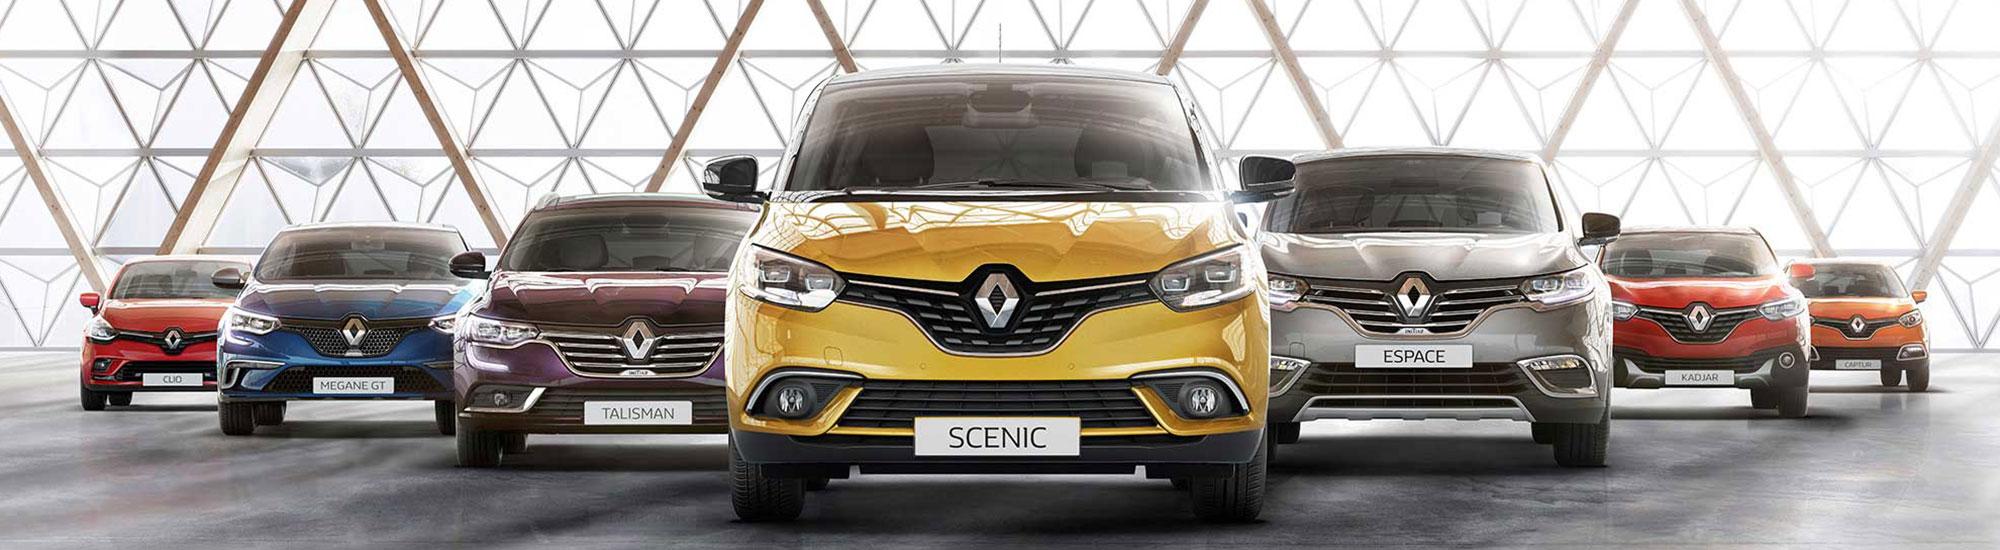 Renault PKWs